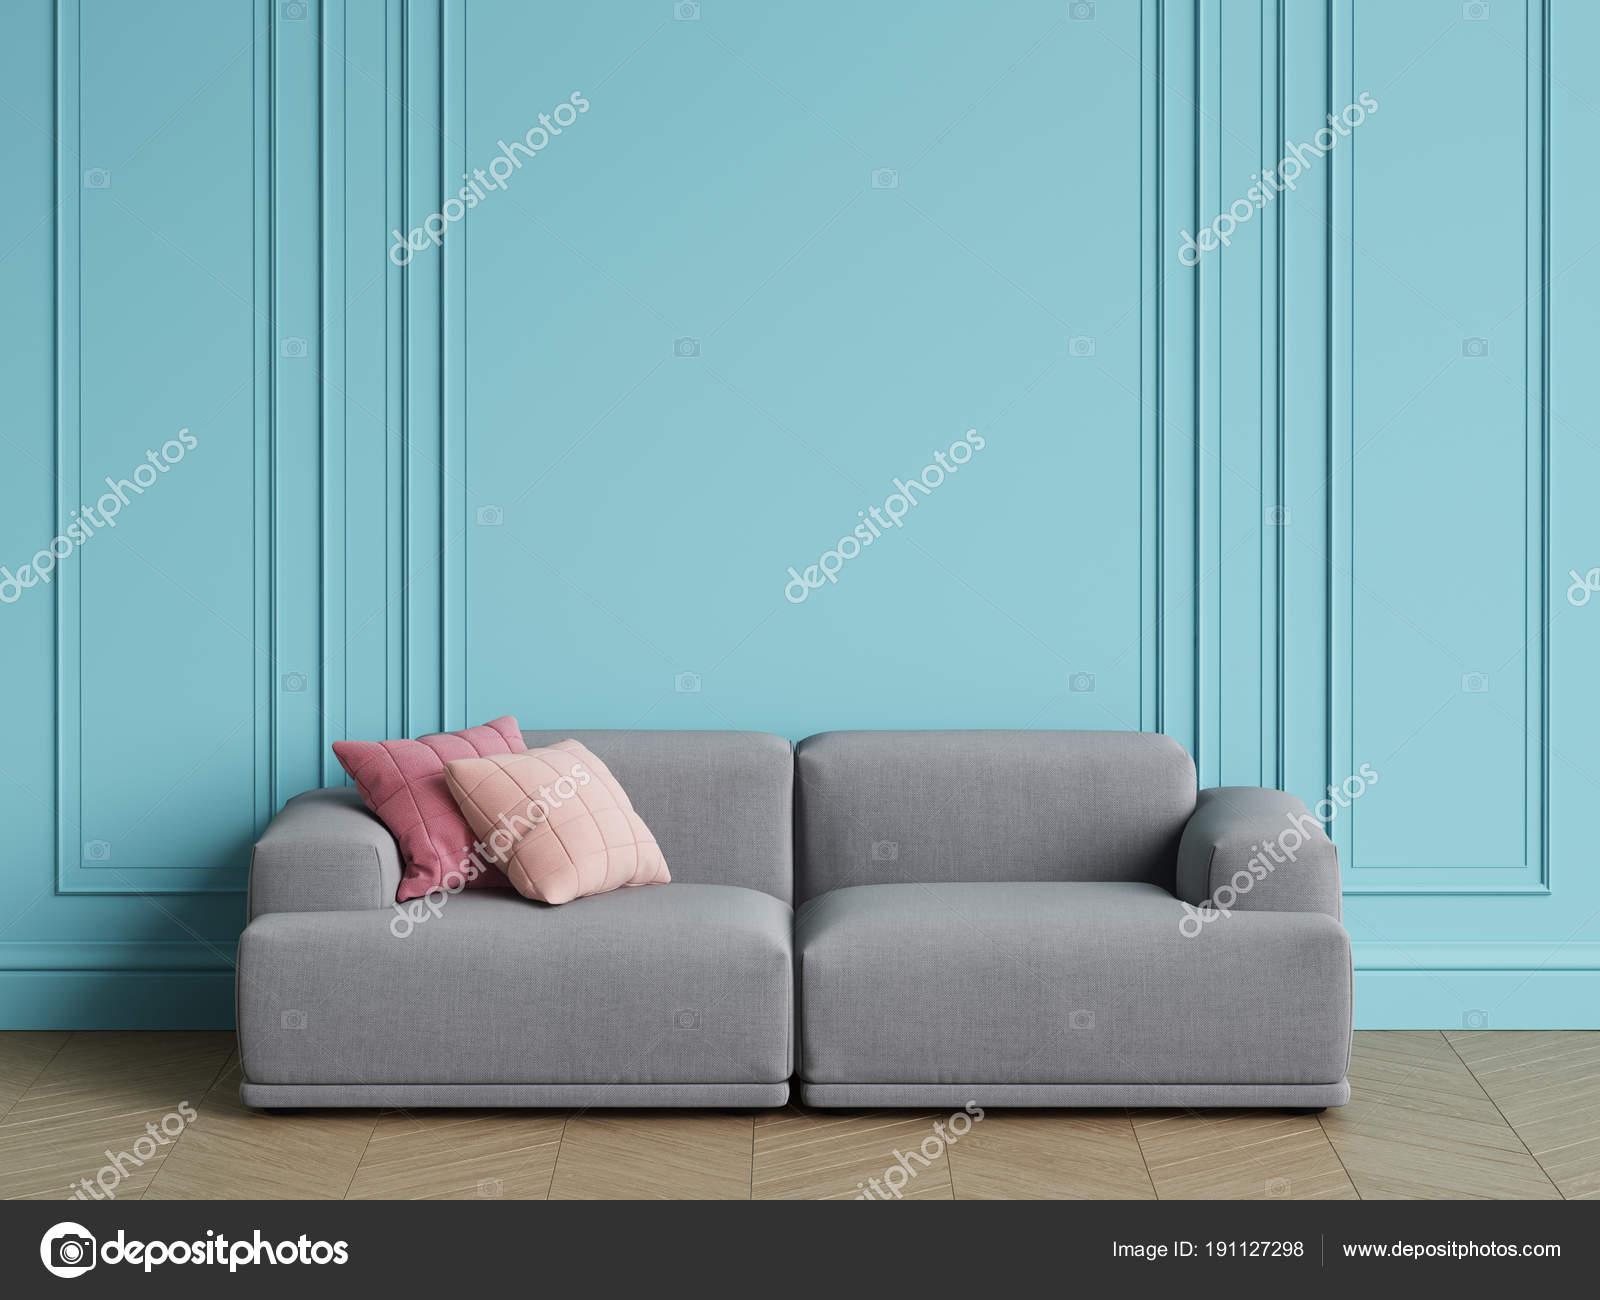 Stupendous Modern Scandinavian Design Grey Sofa Interior Blue Walls Inzonedesignstudio Interior Chair Design Inzonedesignstudiocom